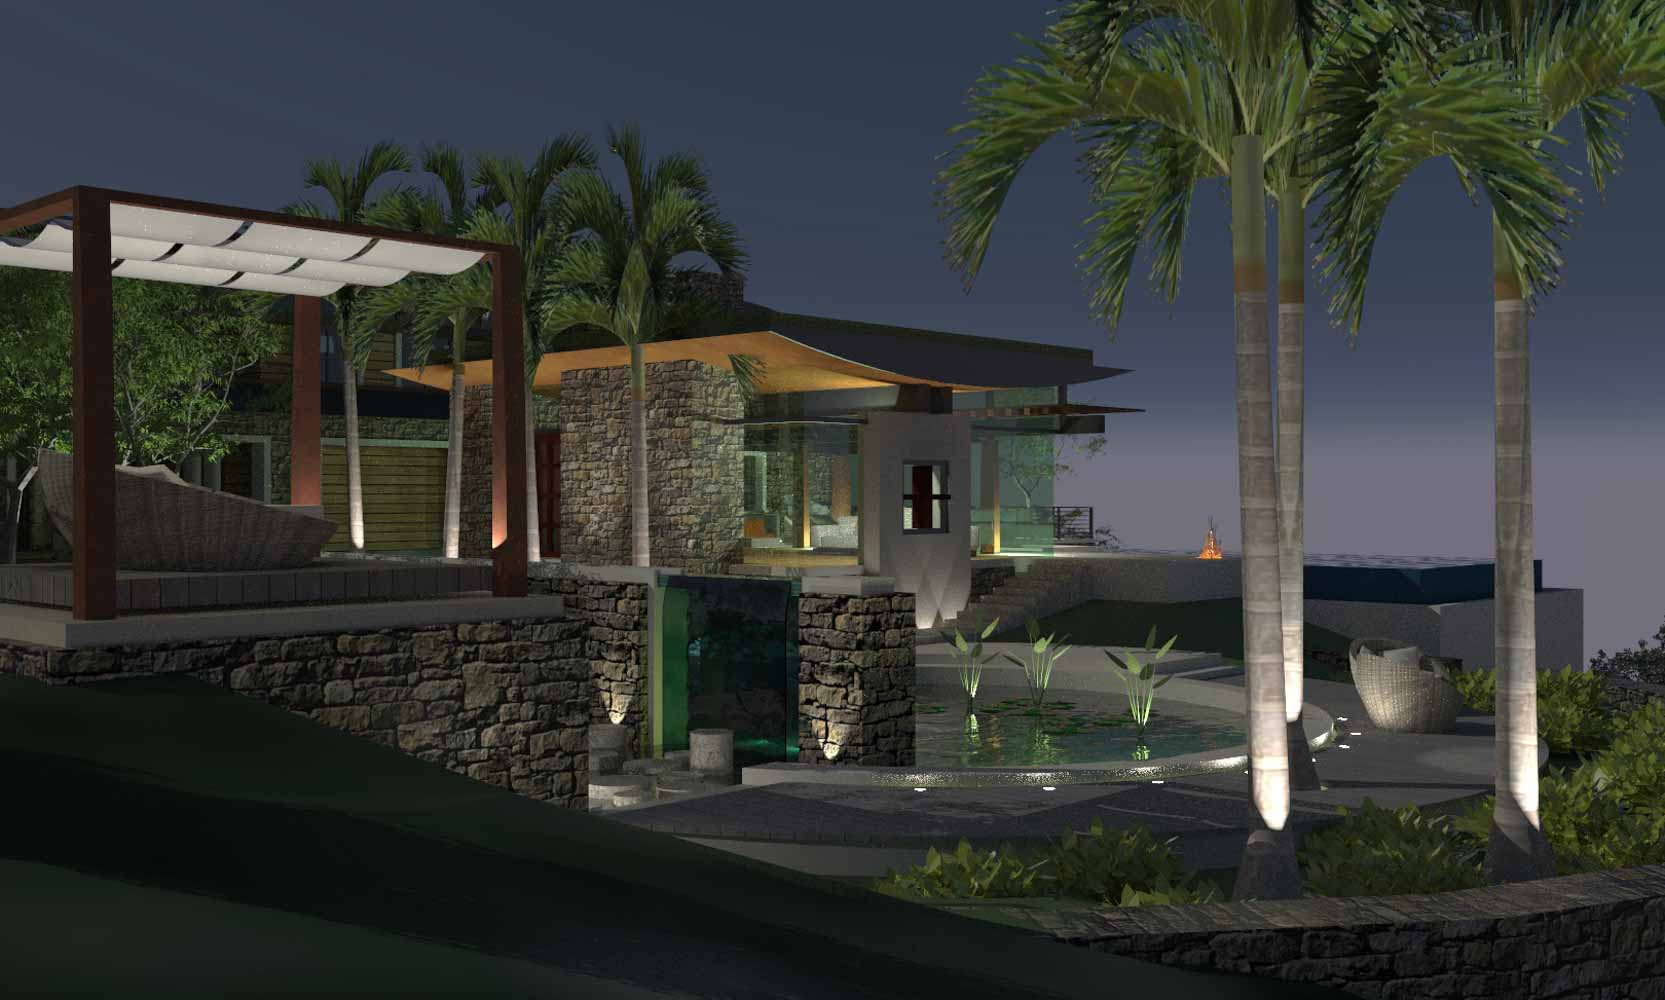 Los Angeles Hillside Modern Glass House by Bjella Architects, Calabasas California